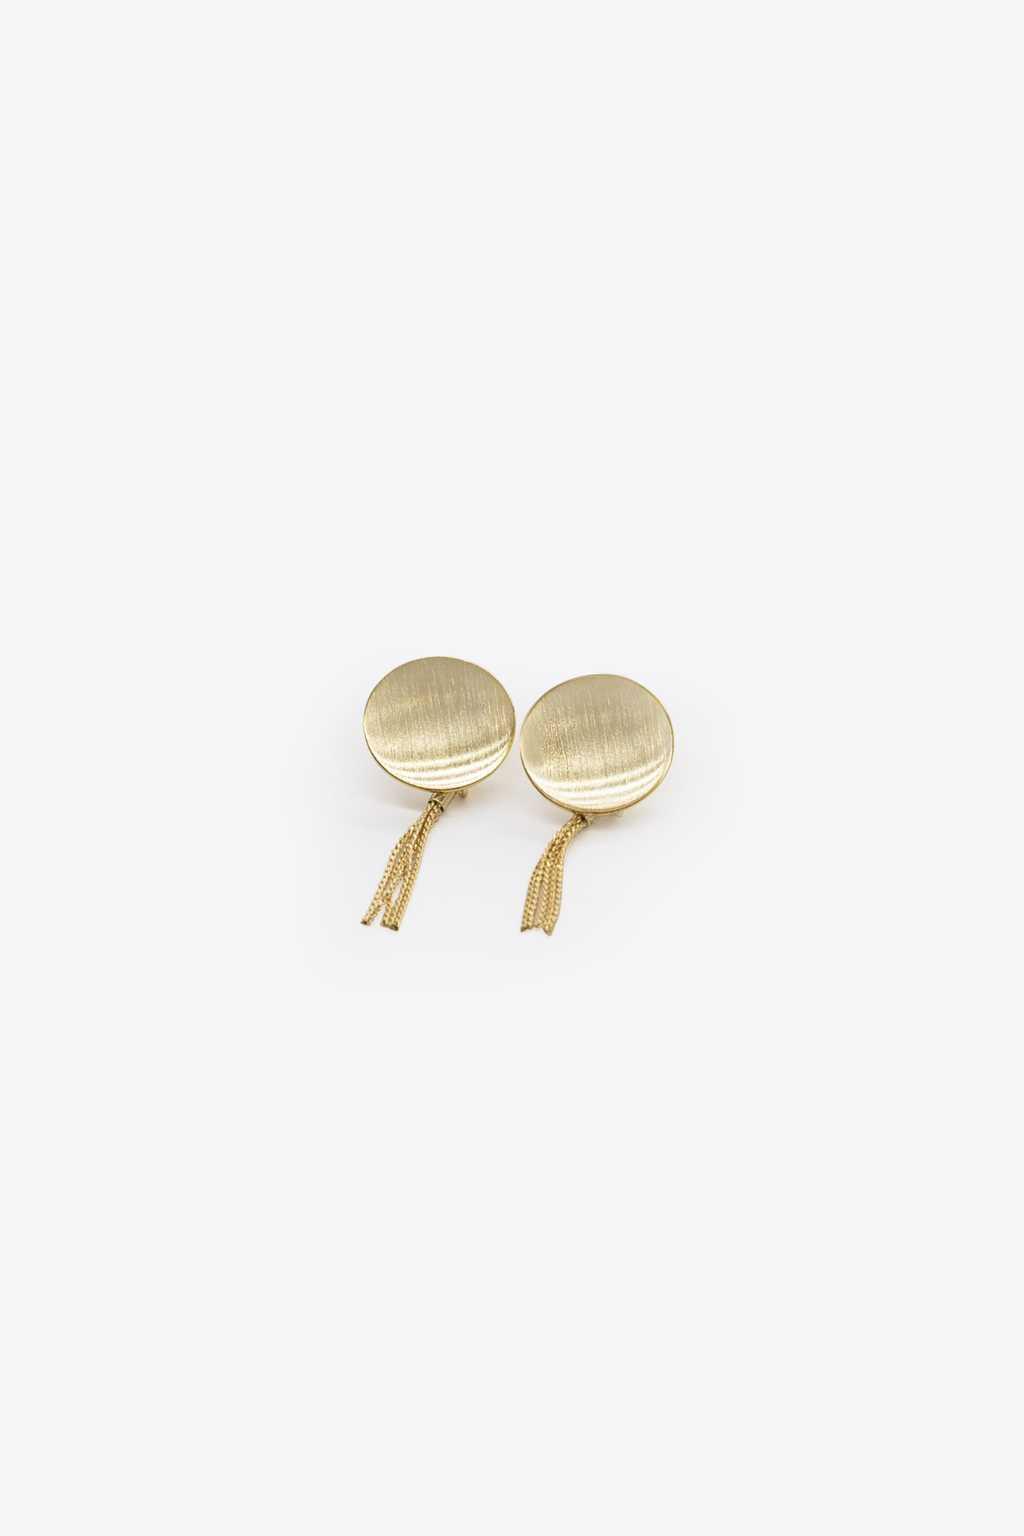 Earring H100 Gold 2